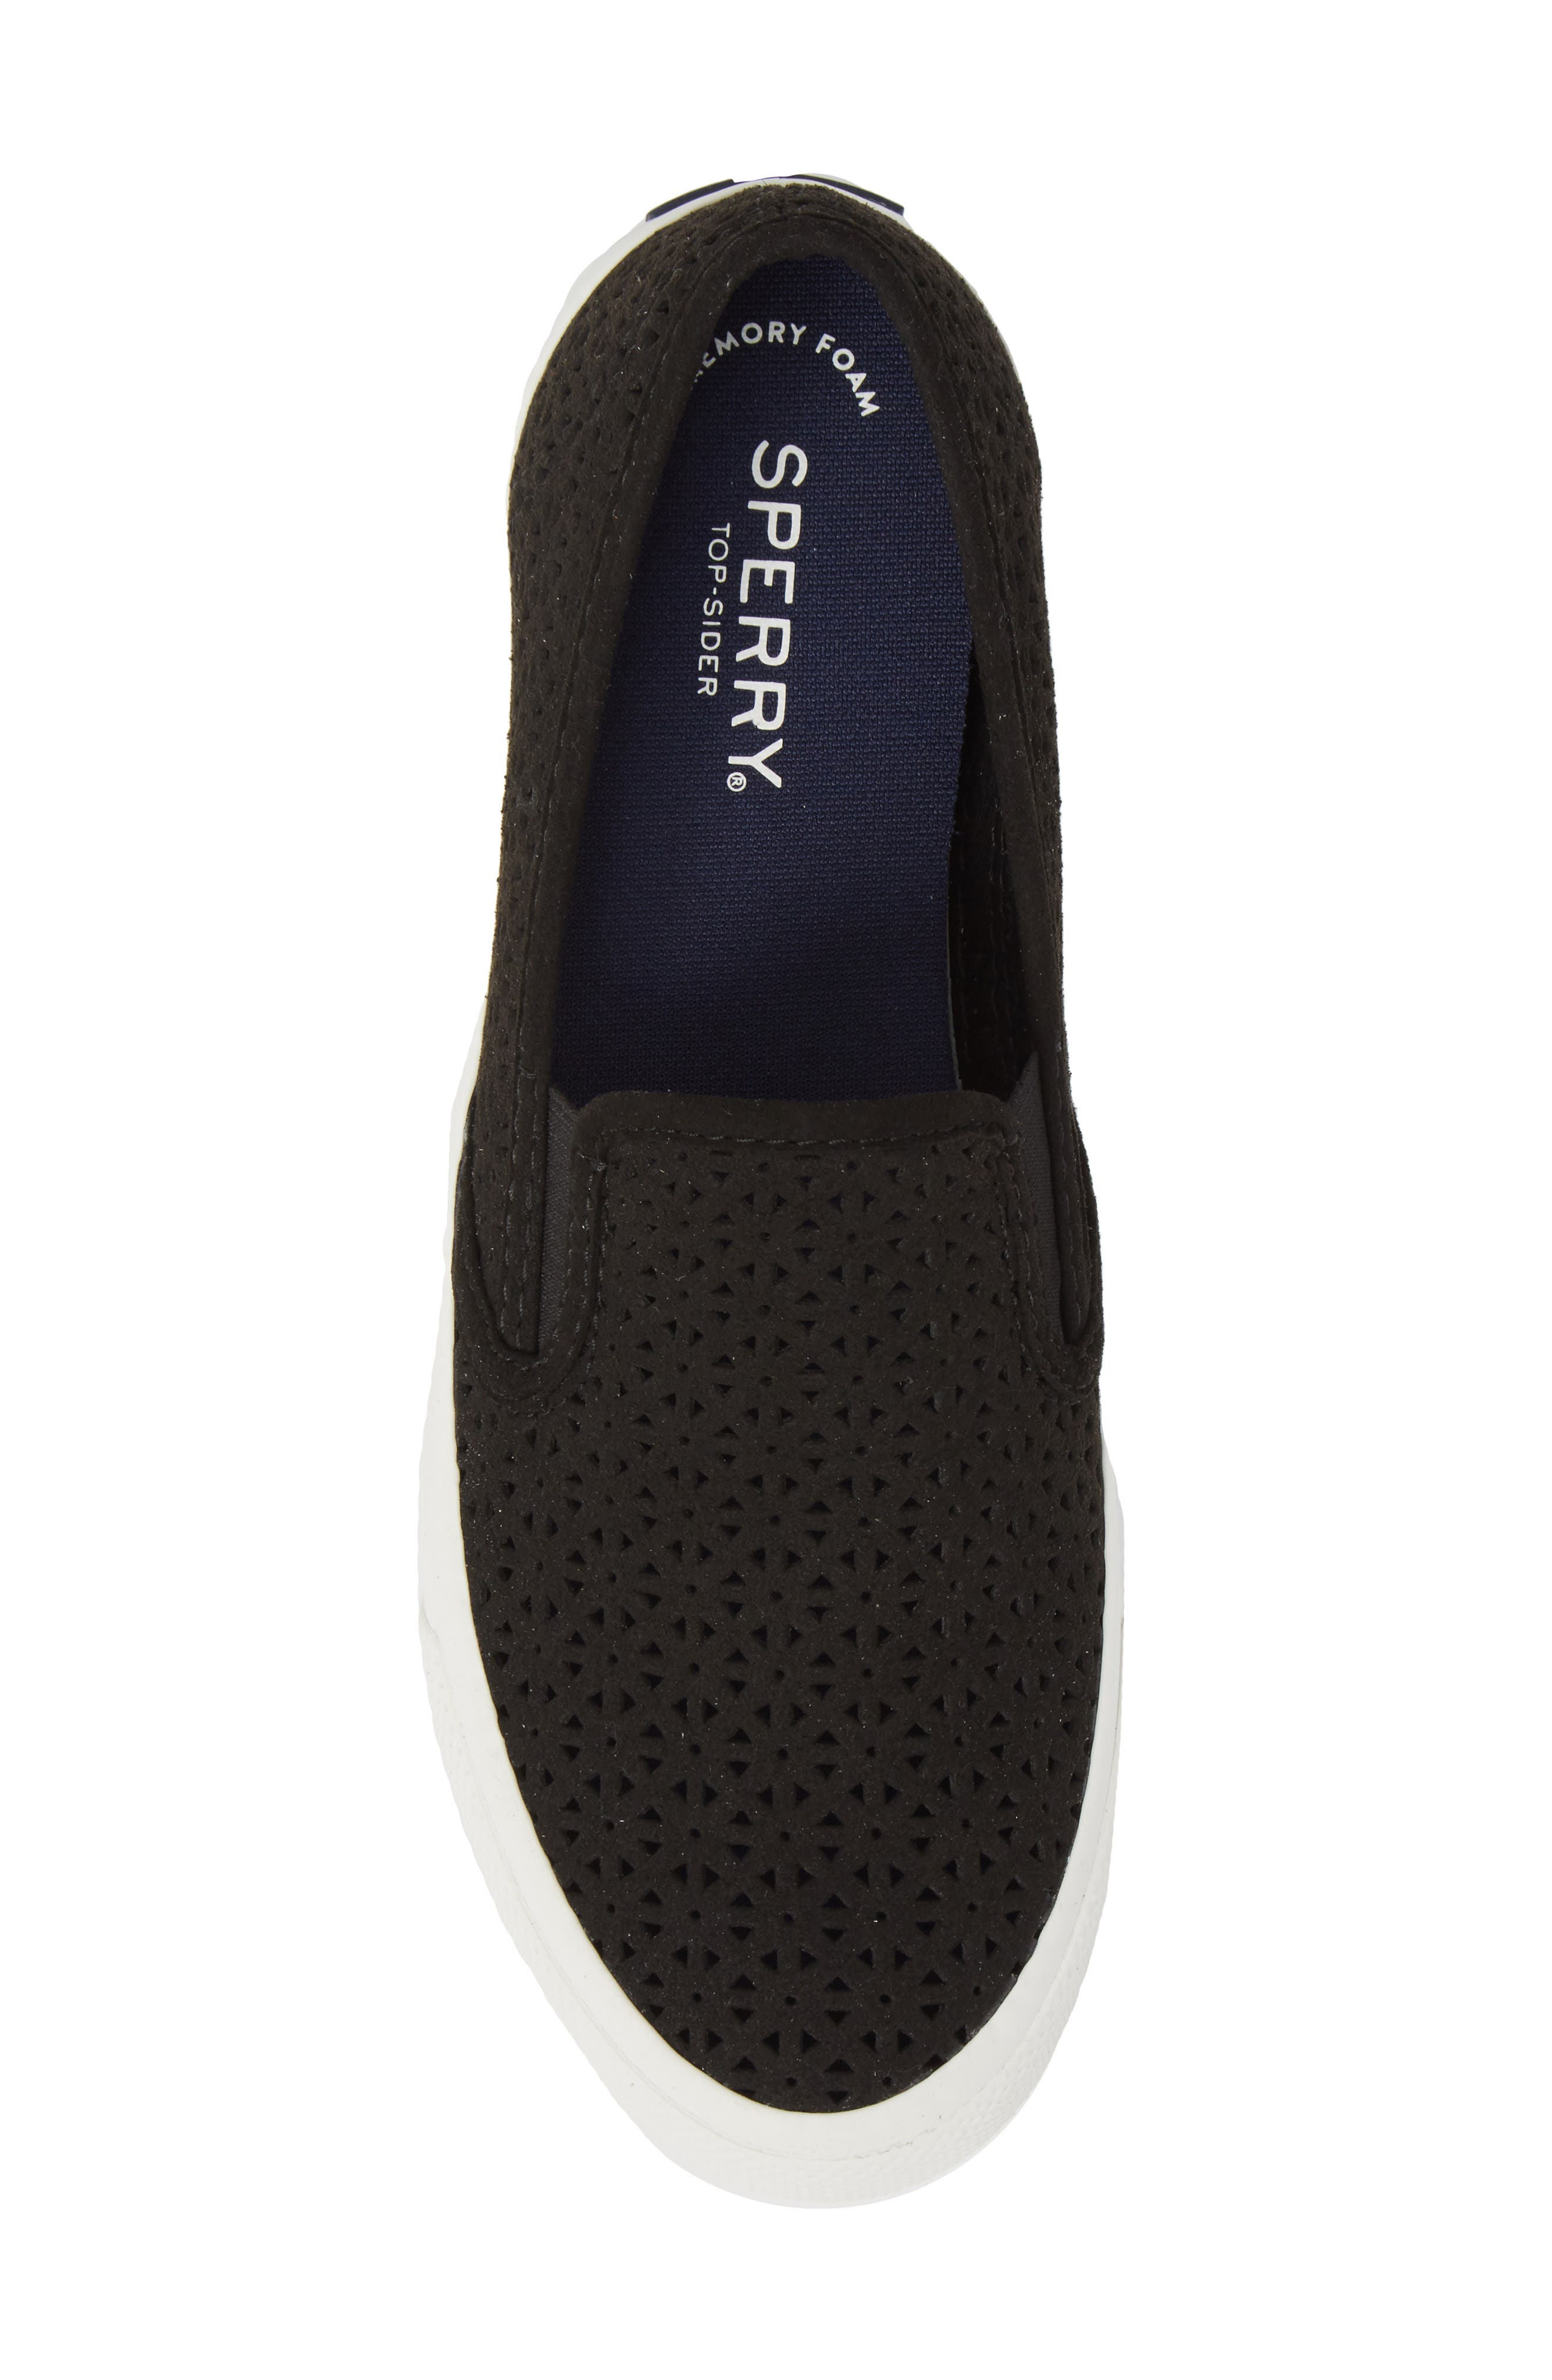 Seaside Nautical Perforated Slip-On Sneaker,                             Alternate thumbnail 5, color,                             BLACK LEATHER